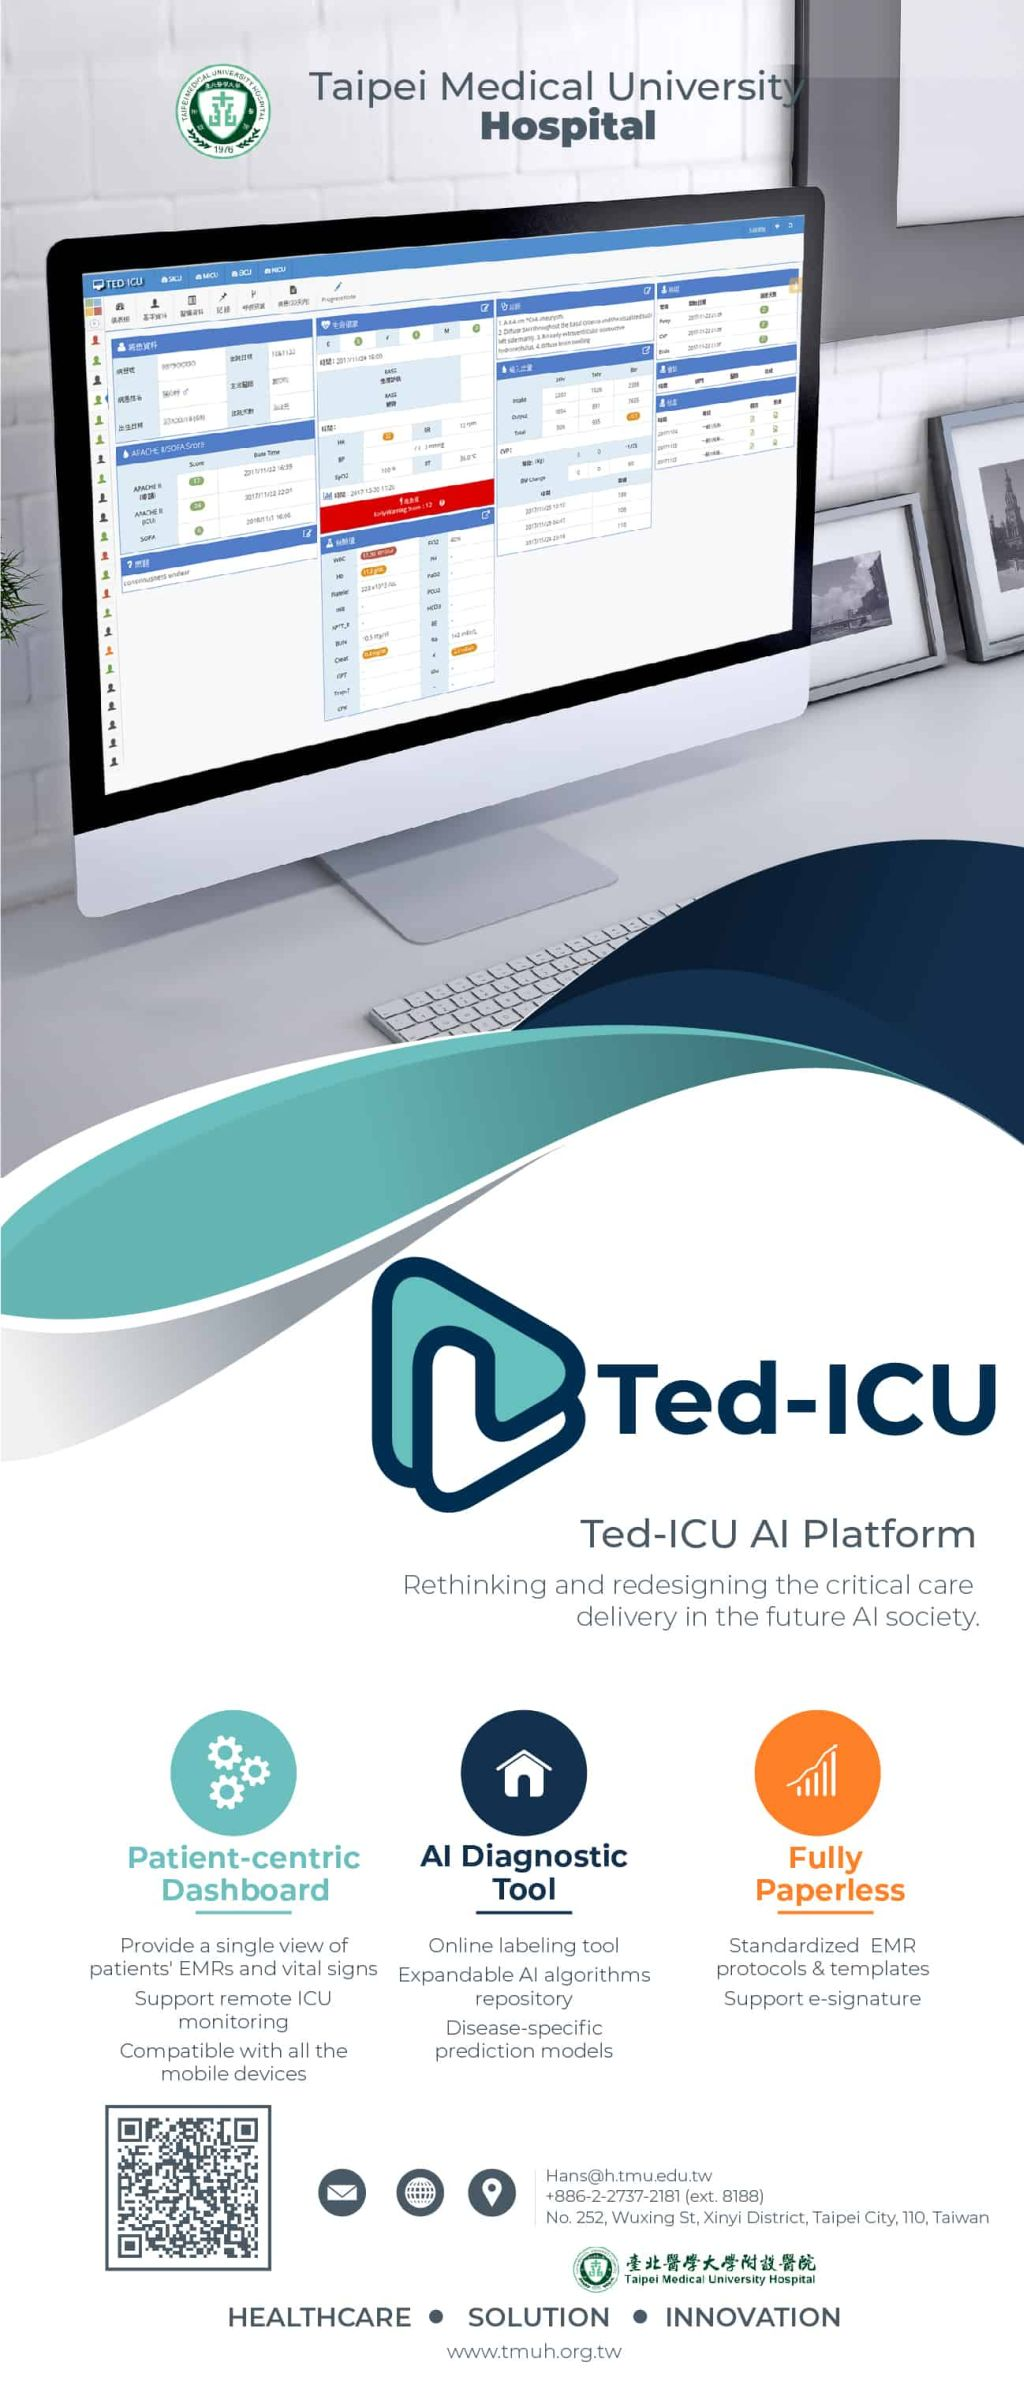 Ted-ICU AI Platform